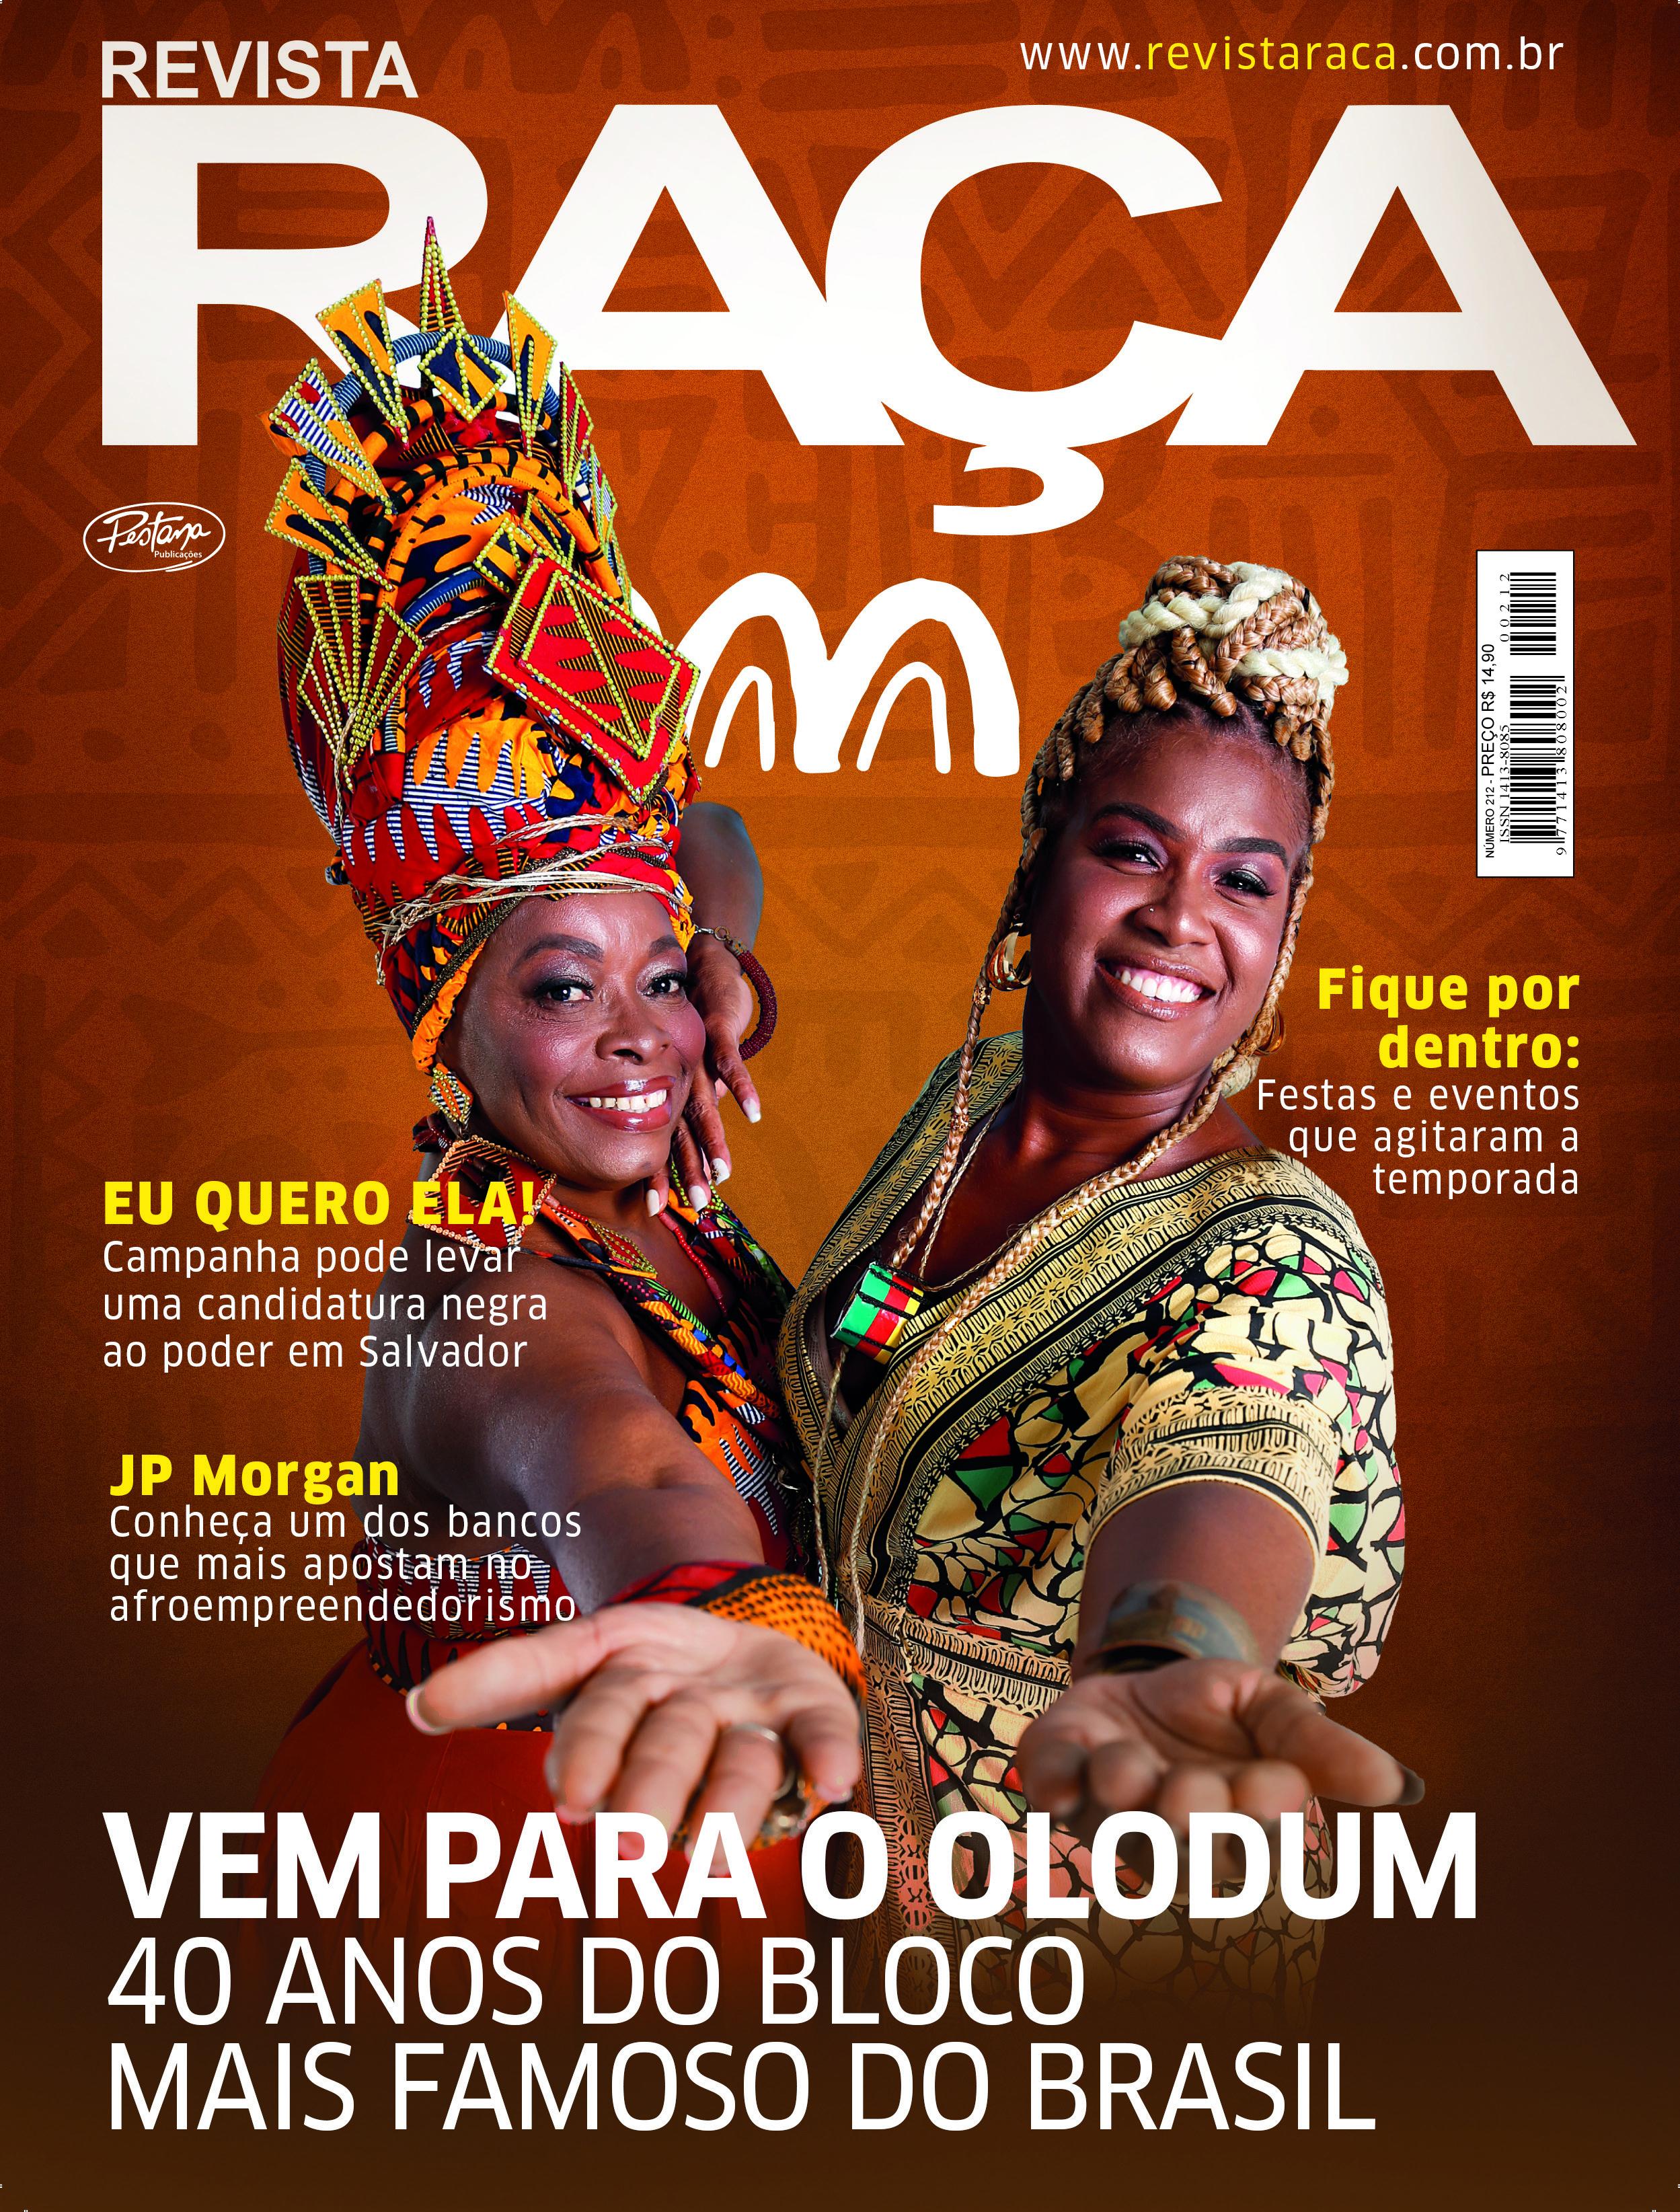 https://revistaraca.com.br/wp-content/uploads/2020/03/CAPA212.jpg